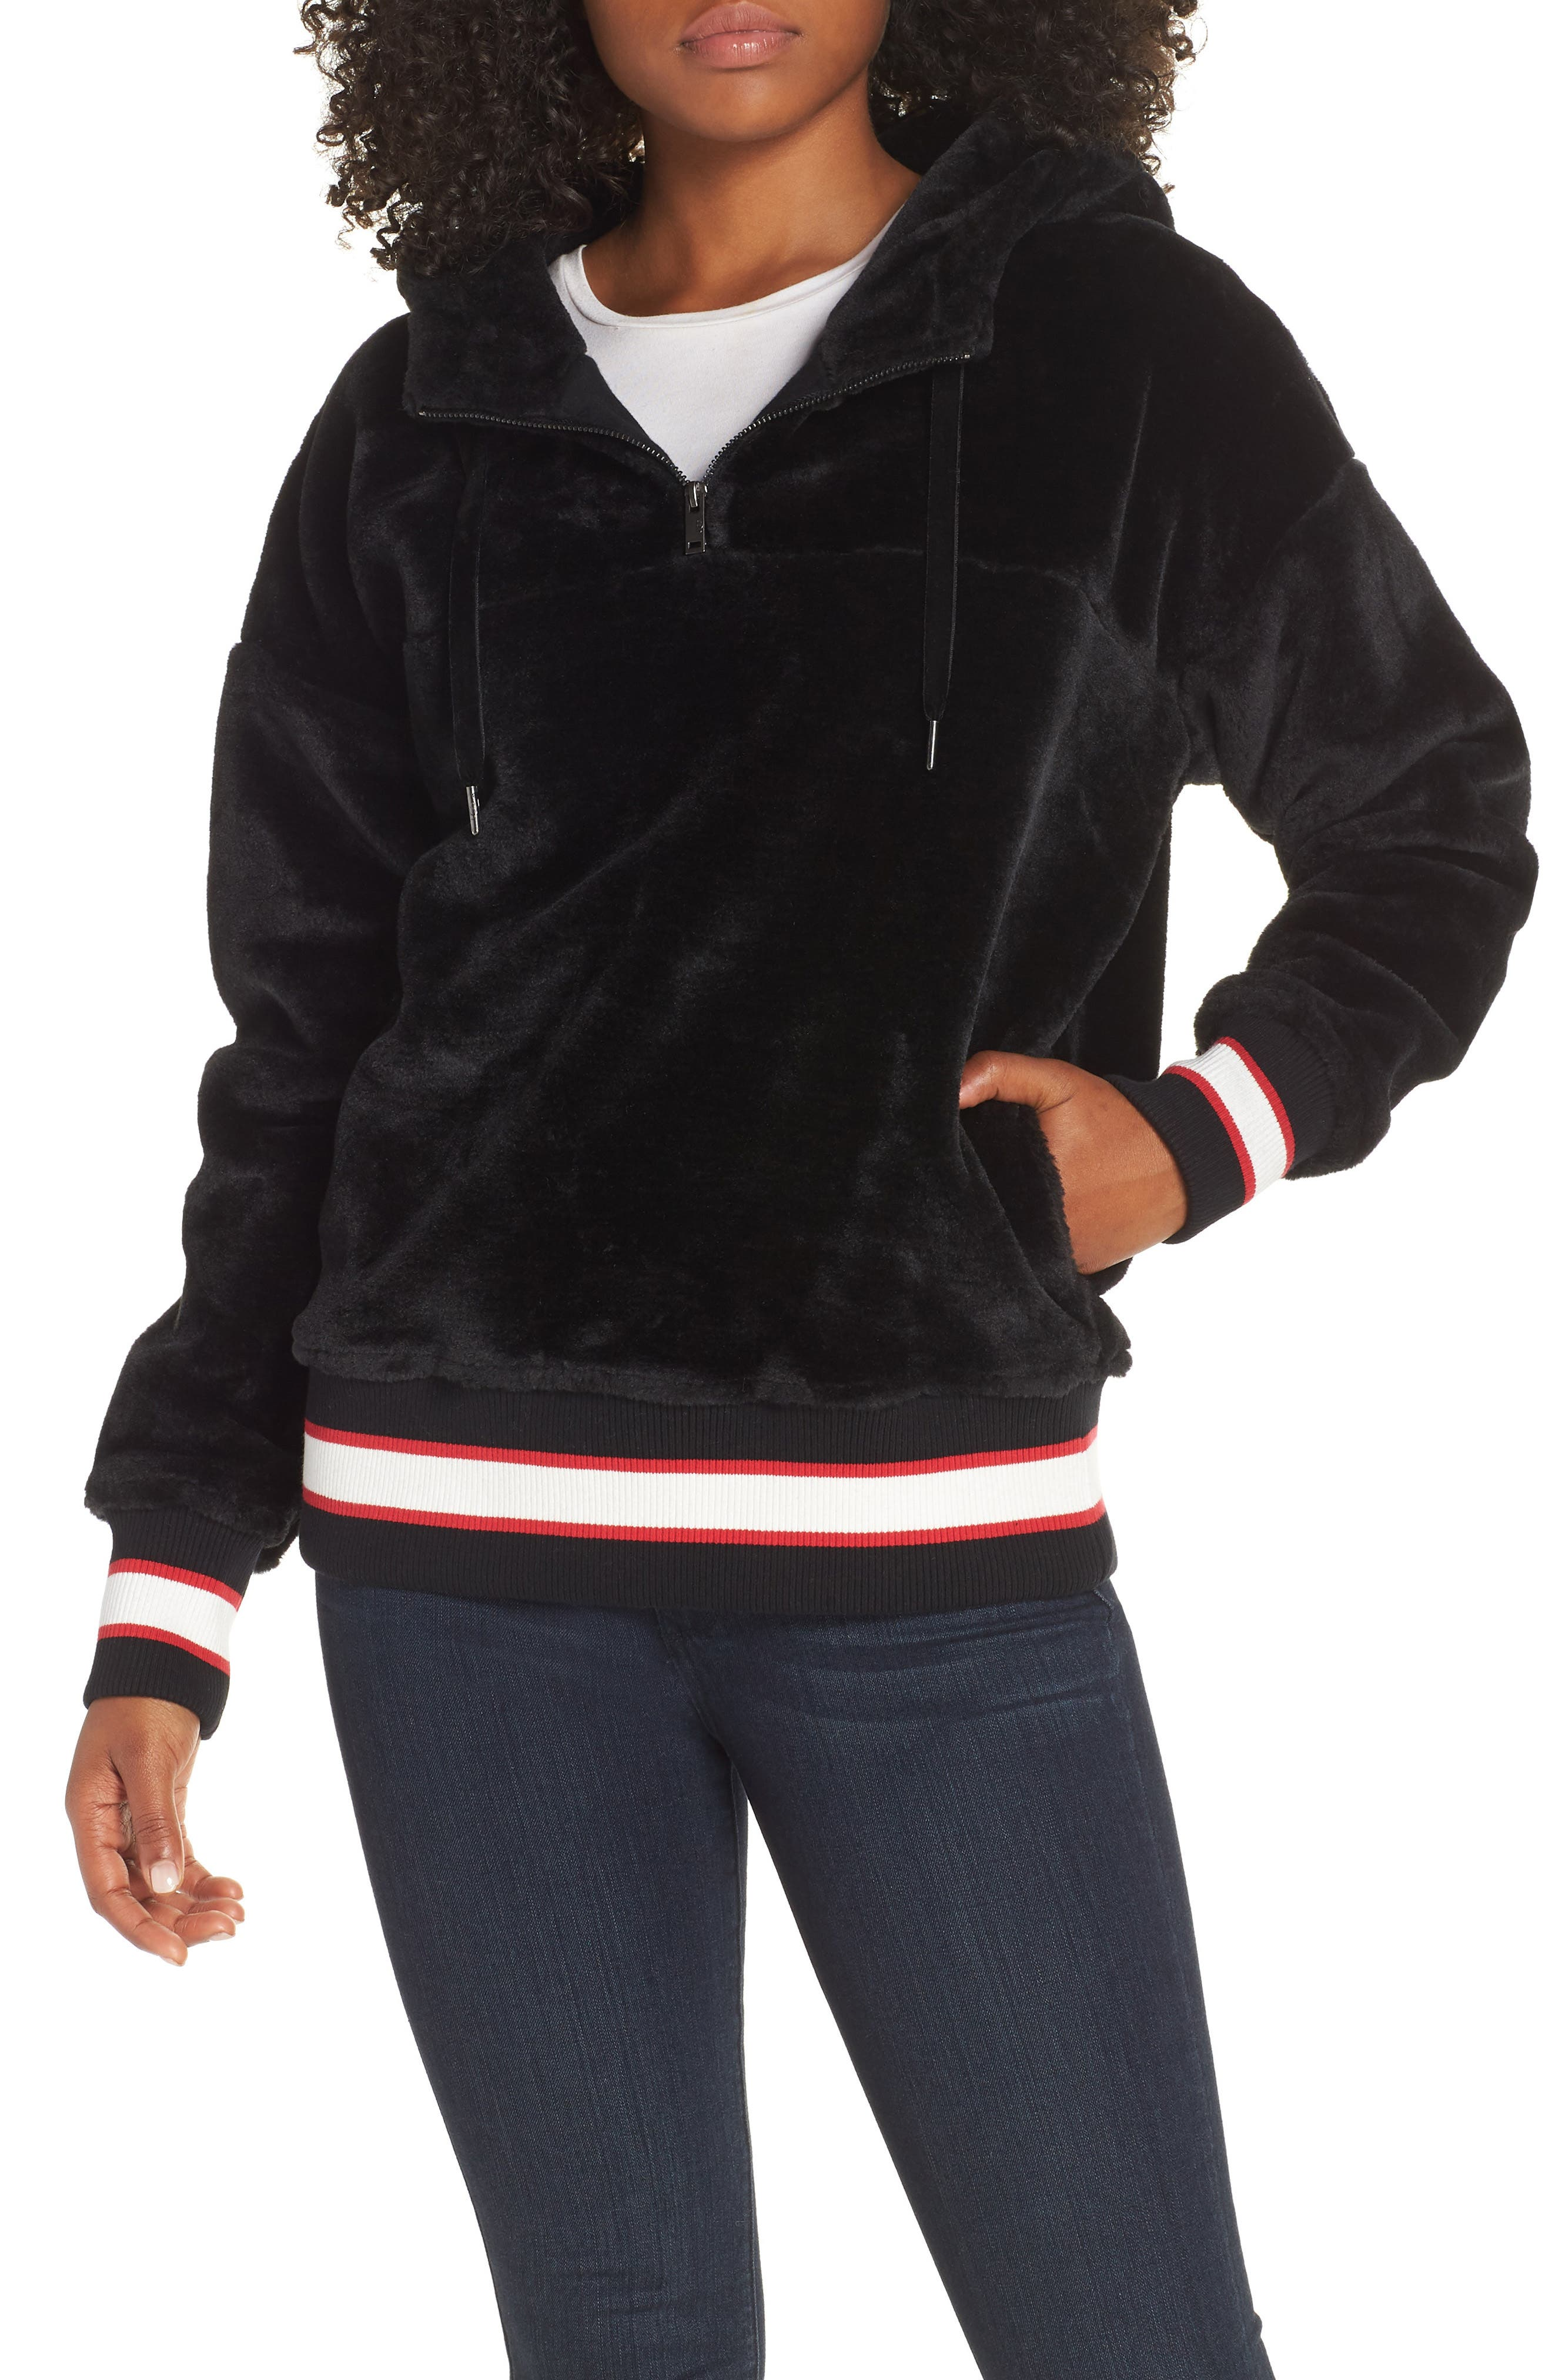 Ugg Kailani High Pile Fleece Hoodie, Black